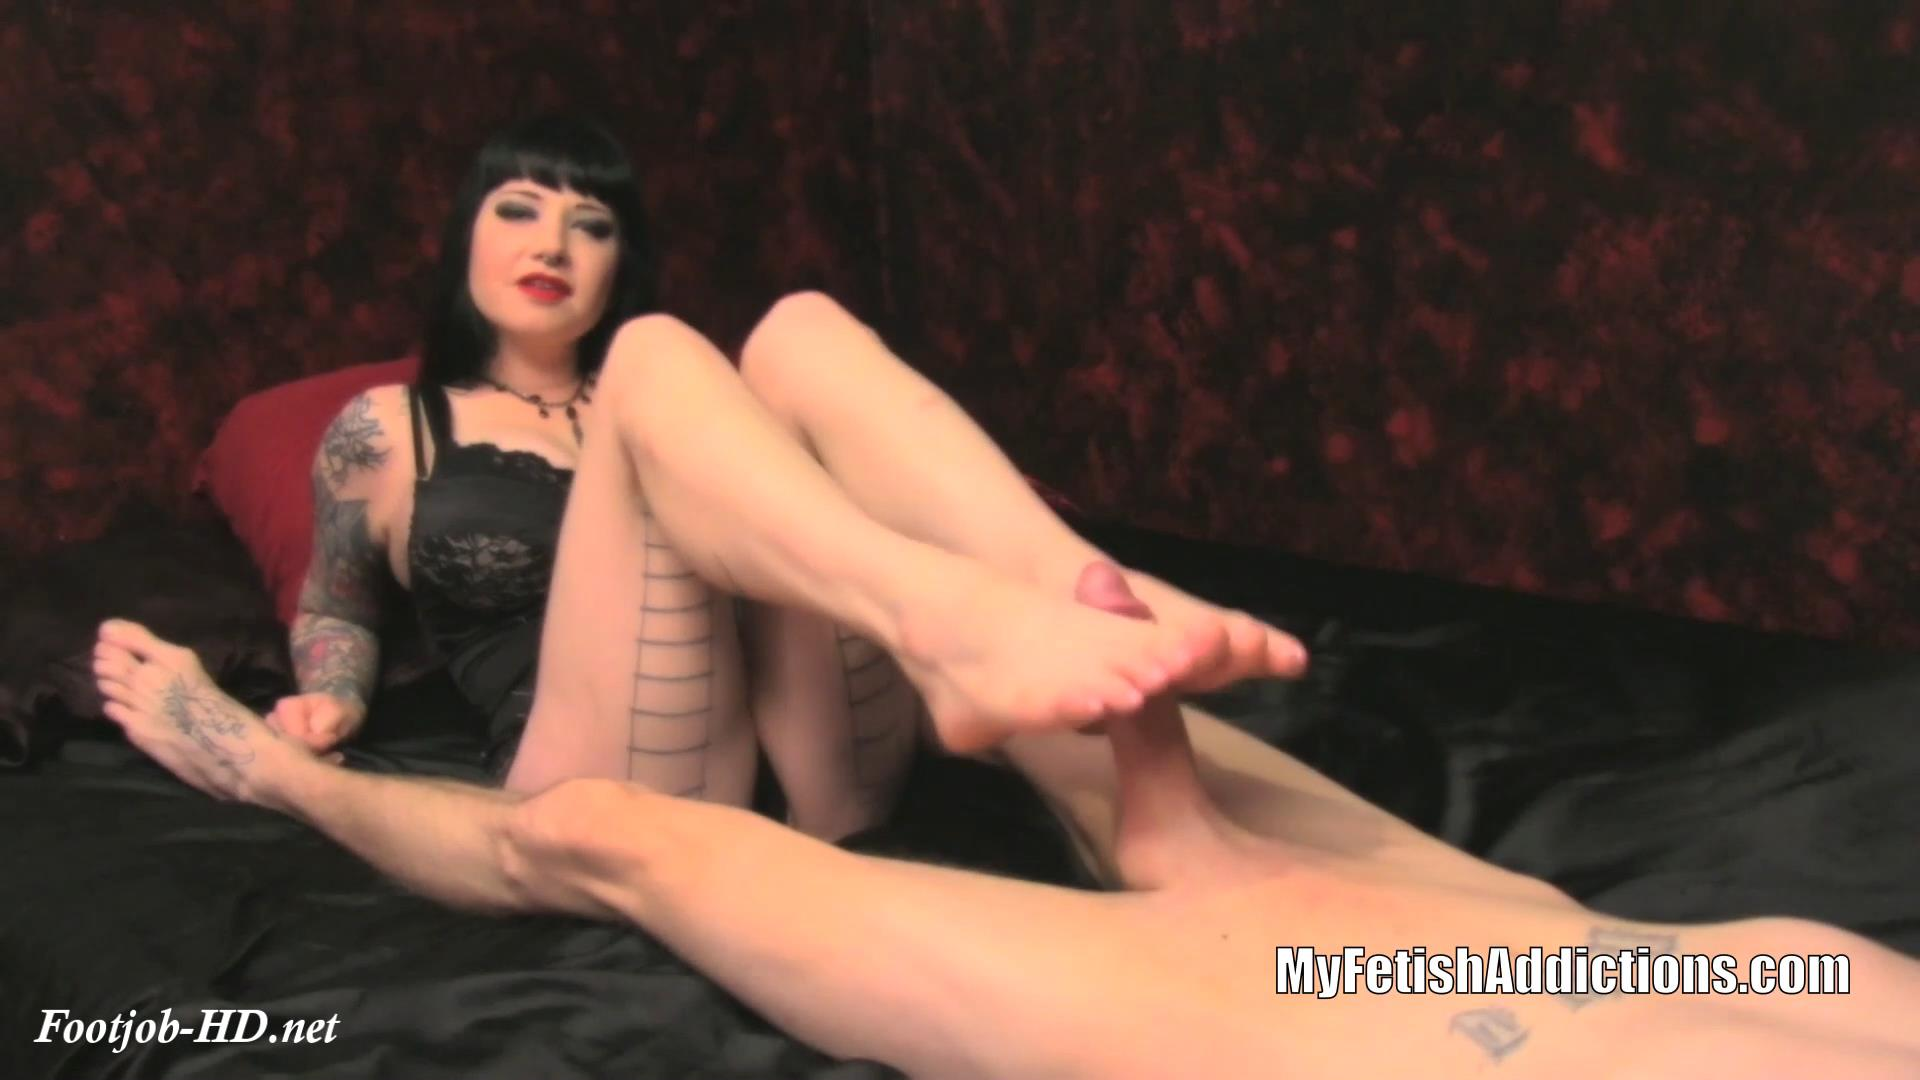 Lick_My_Lover\'s_Cum_Off_My_Soles_-_My_Fetish_Addictions_-_Maya_Sinstress.jpg